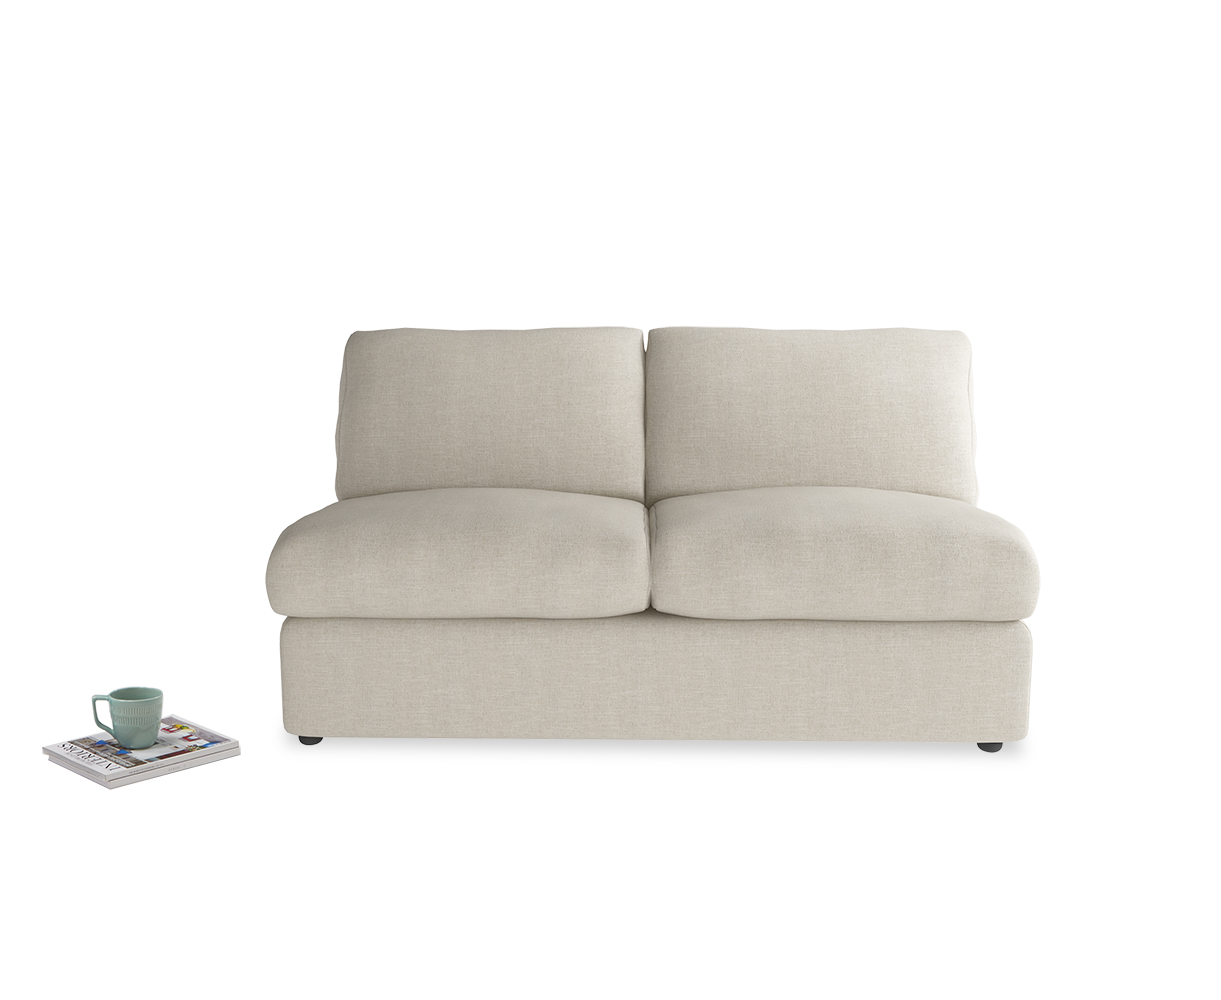 Chatnap Sofa Bed Double Modular